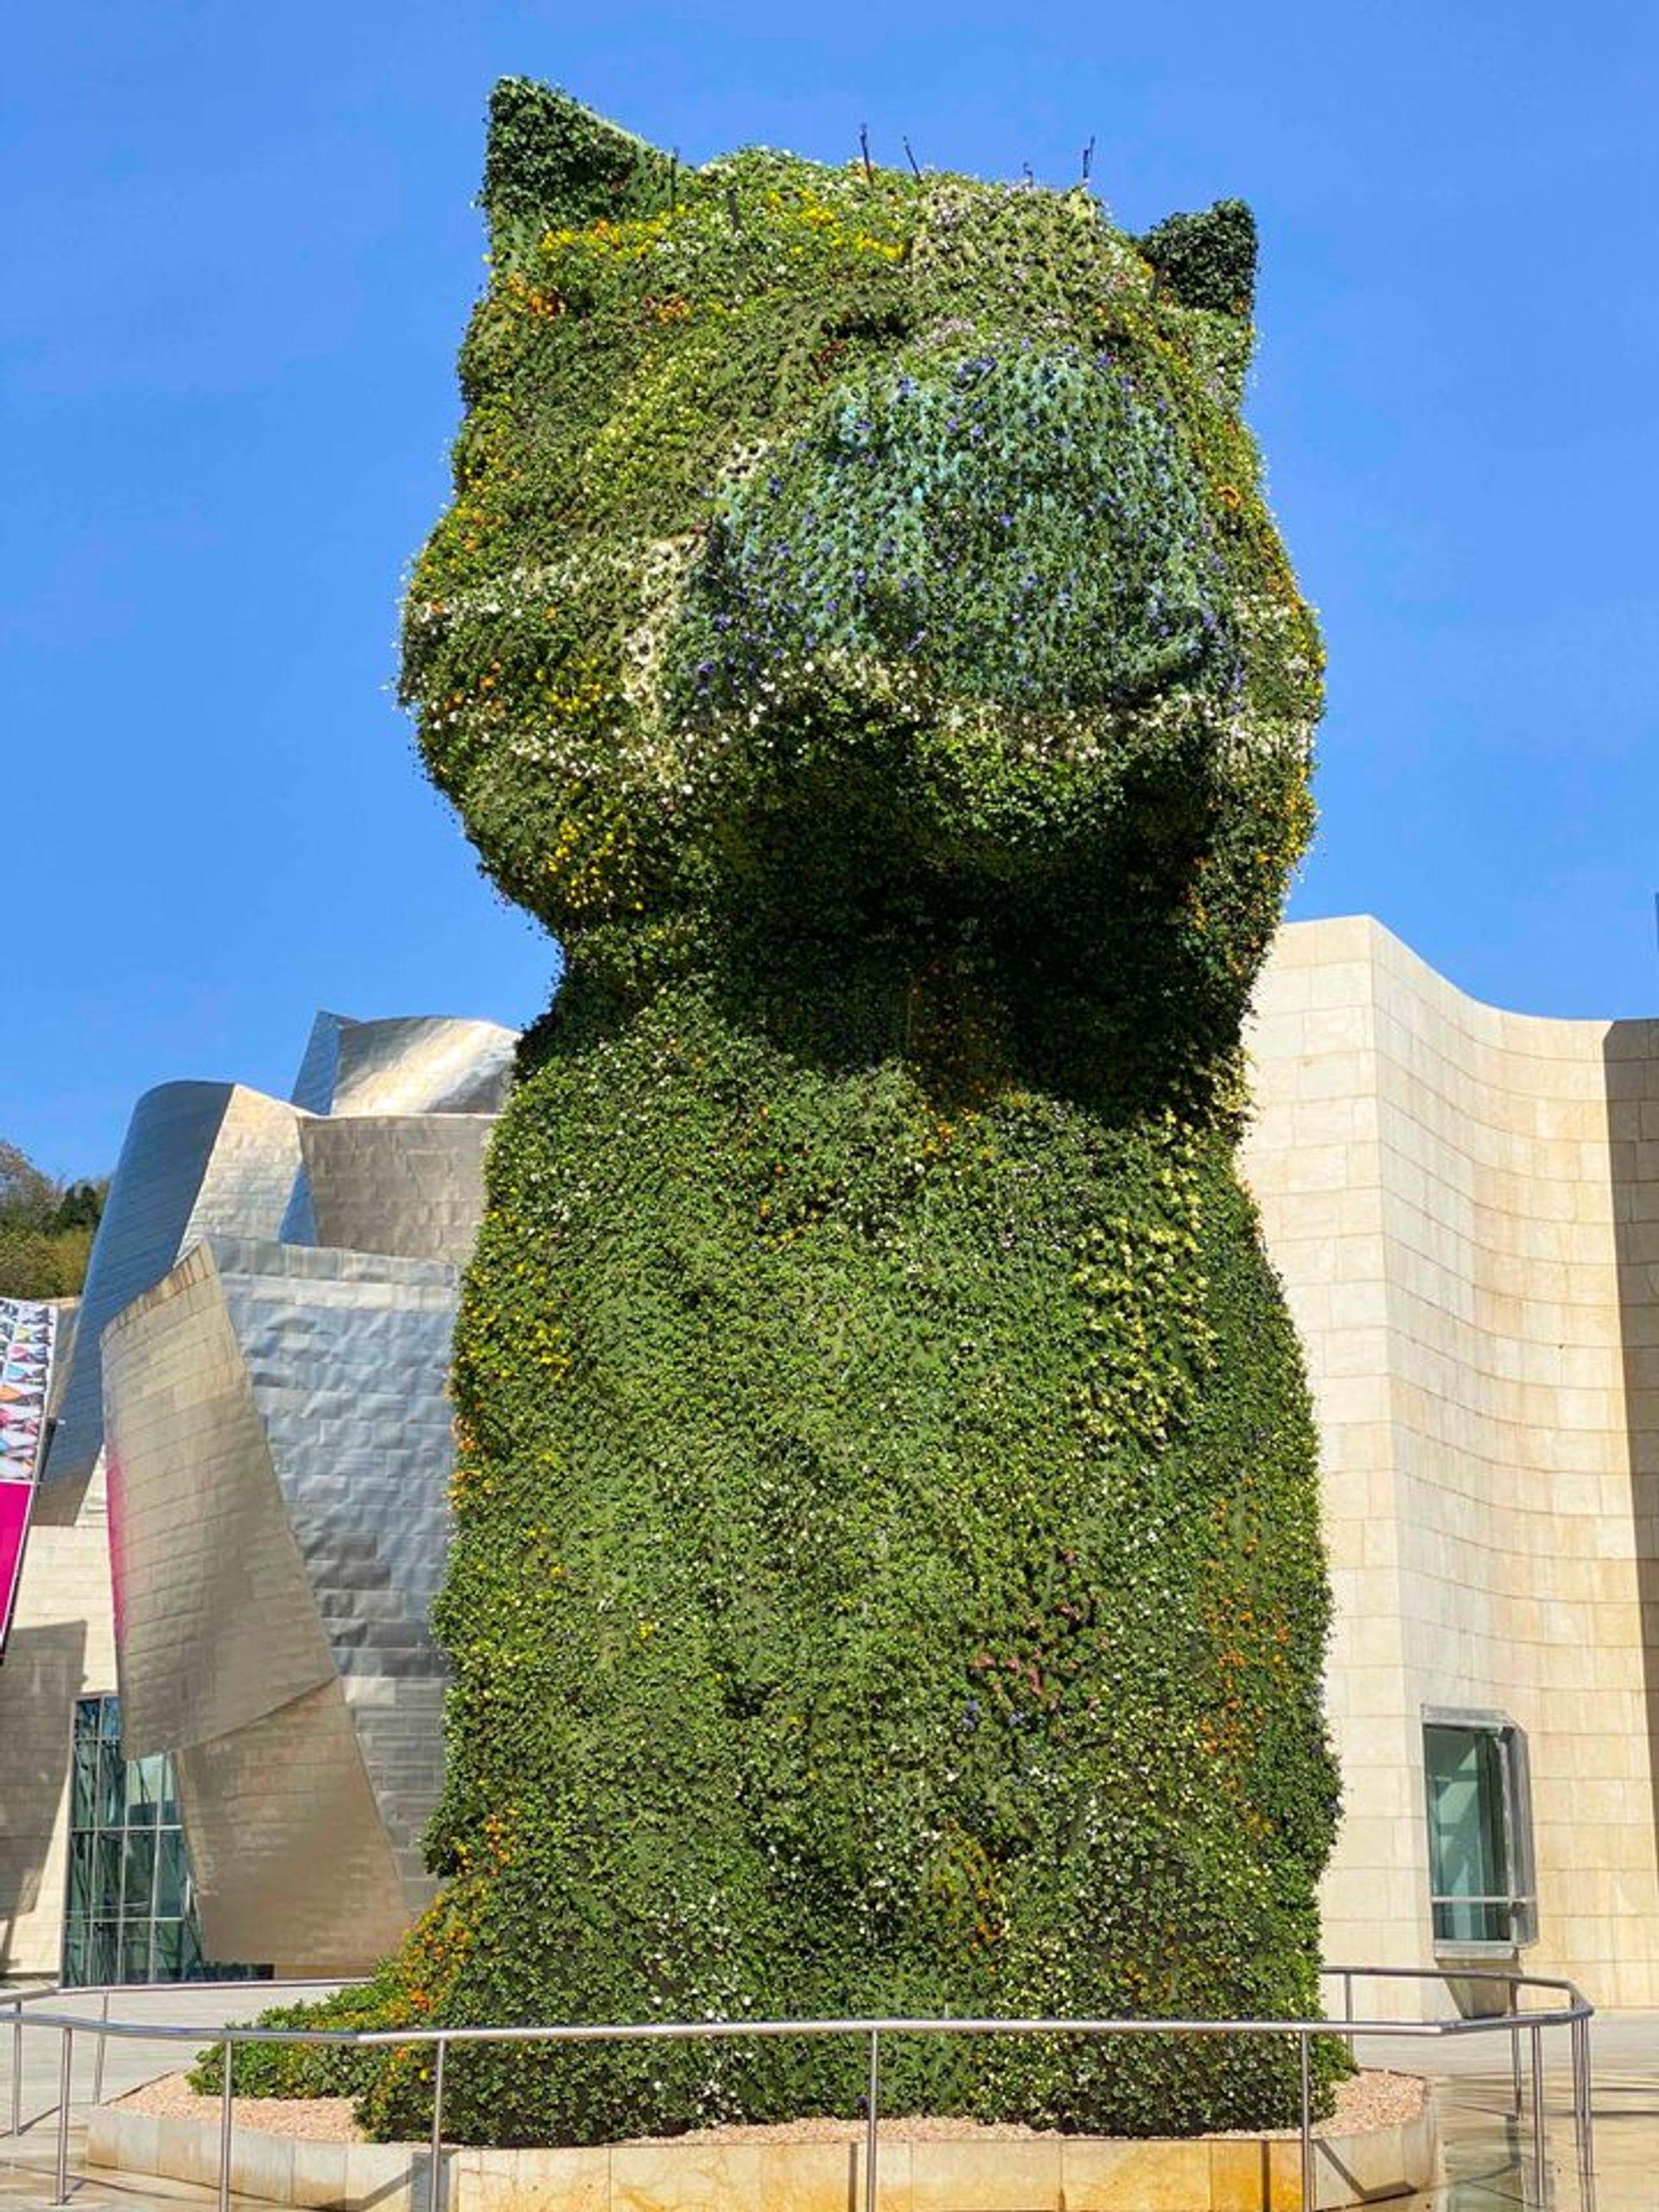 Puppy, Jeff Koons (1997) courtesy Guggenheim Museum Bilbao